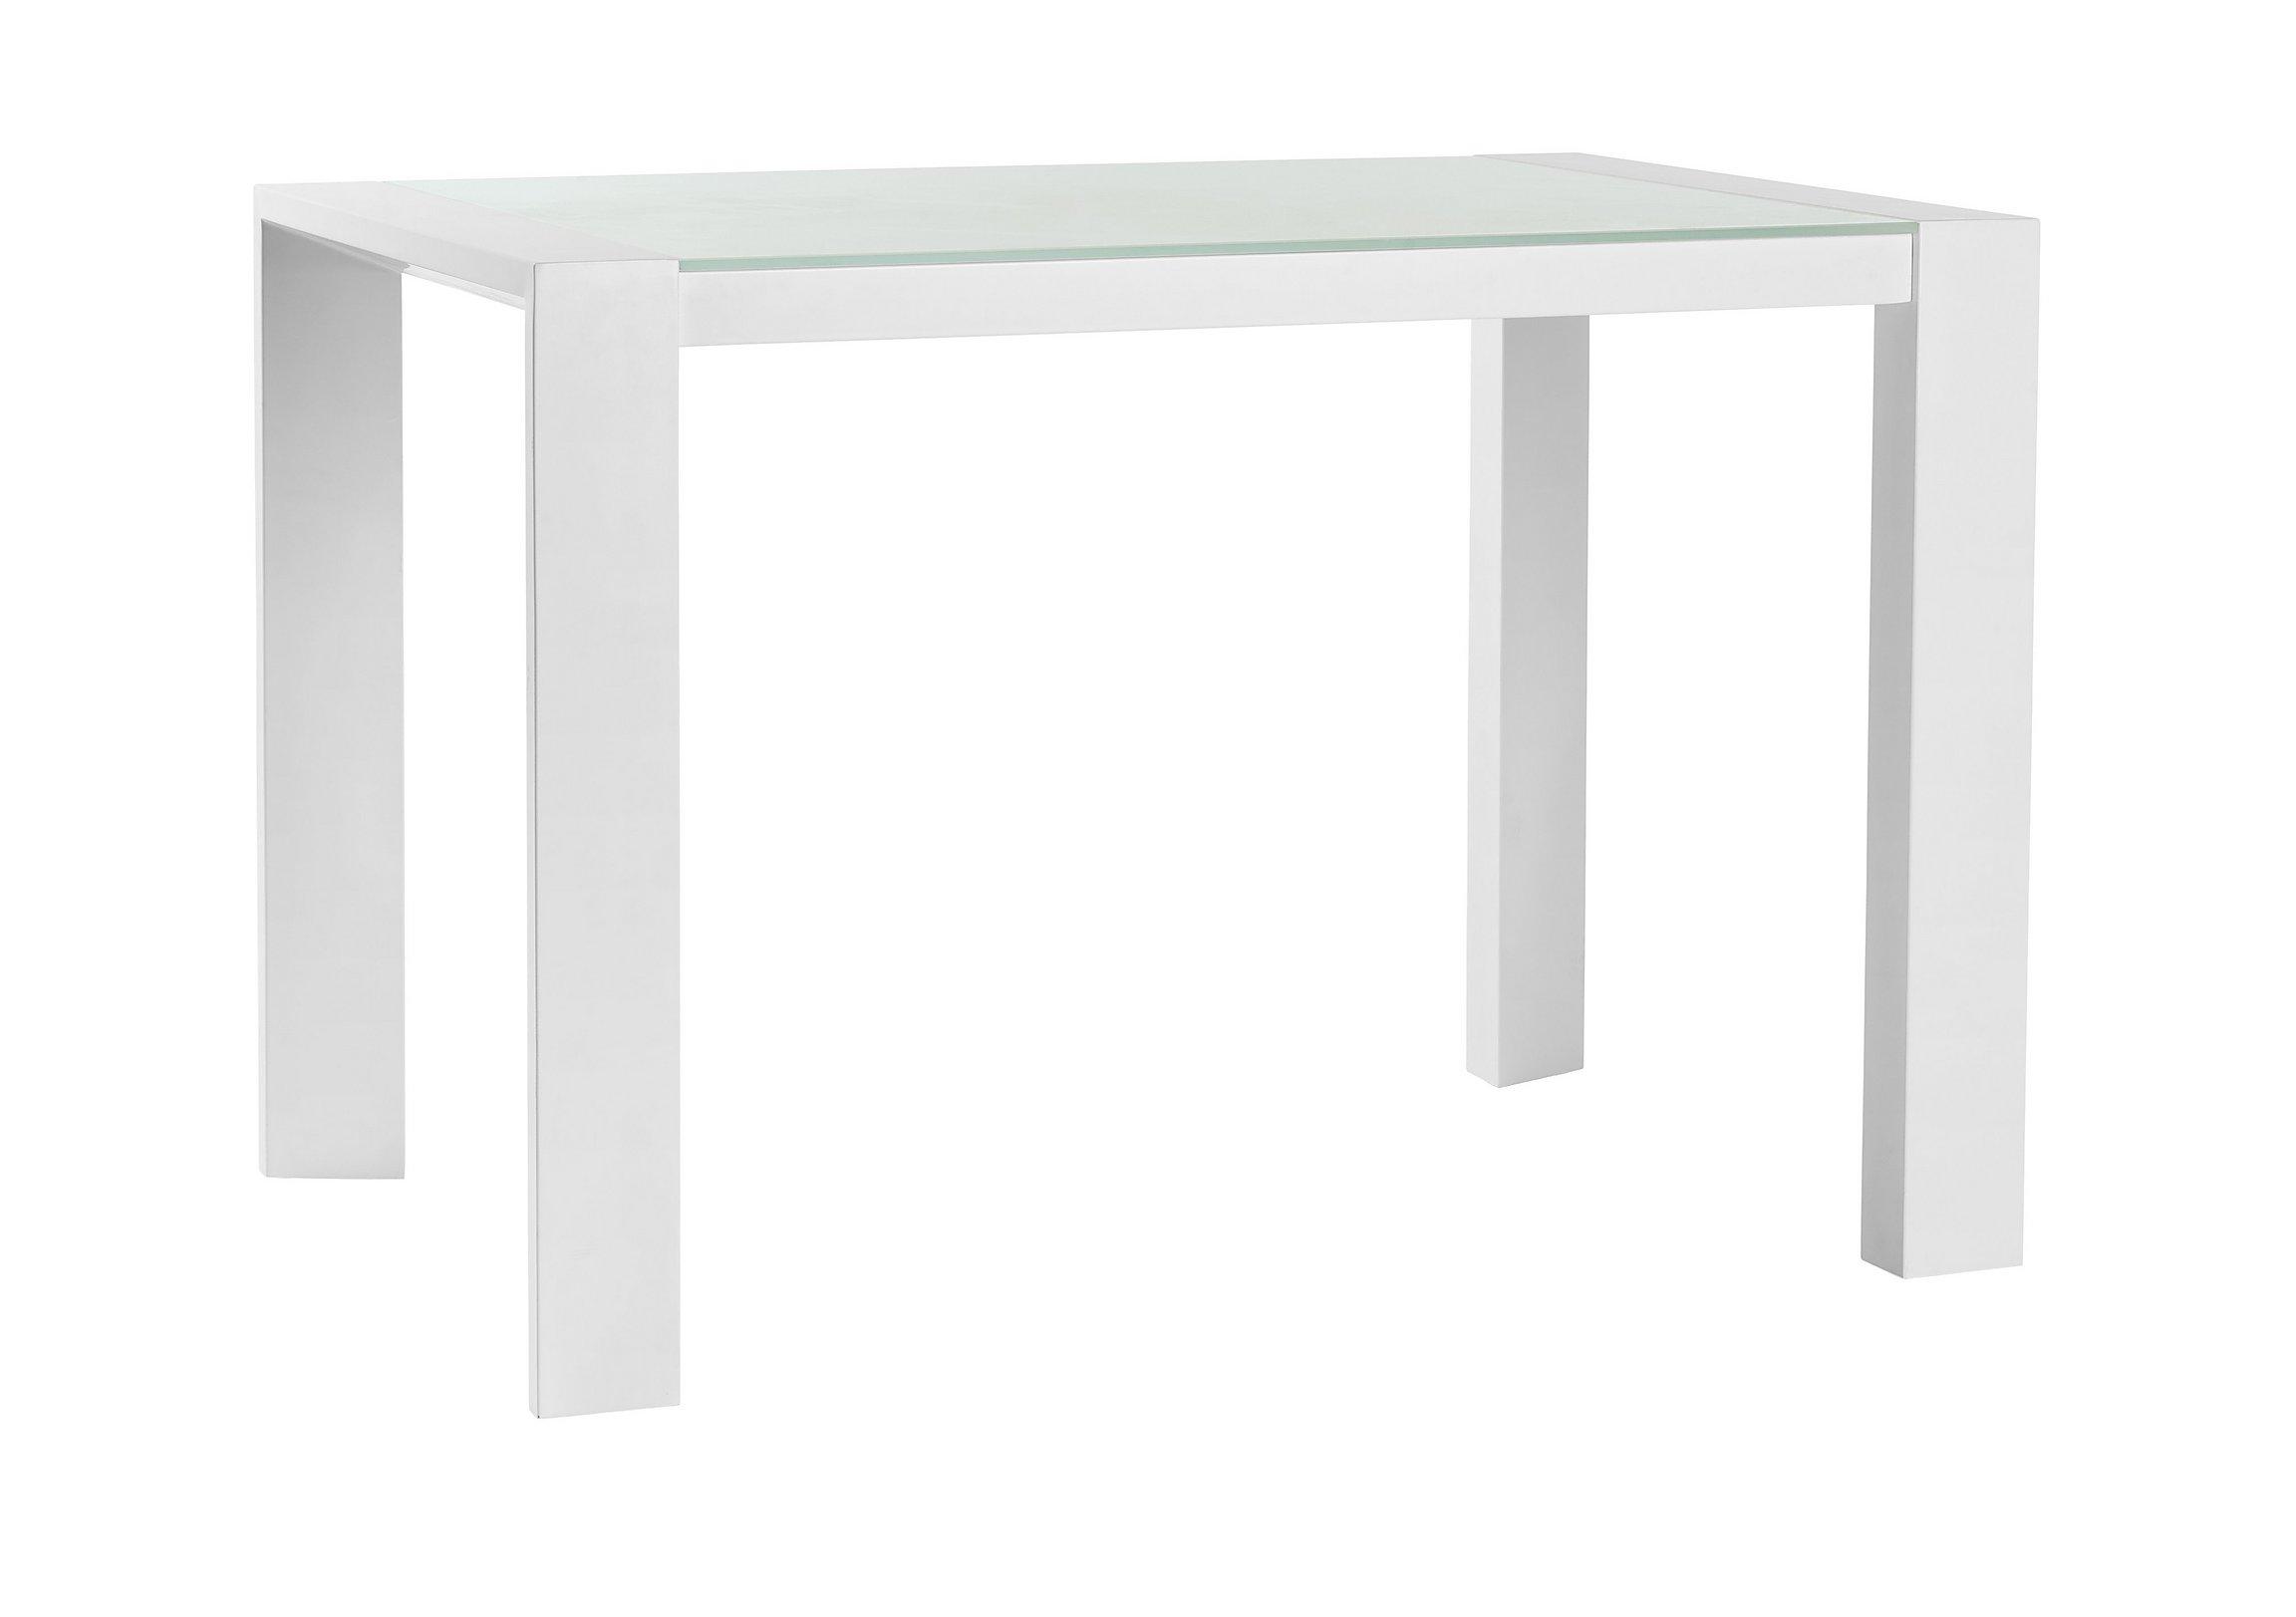 quadra bar table  habufa  furniture village - quadra bar table loading images